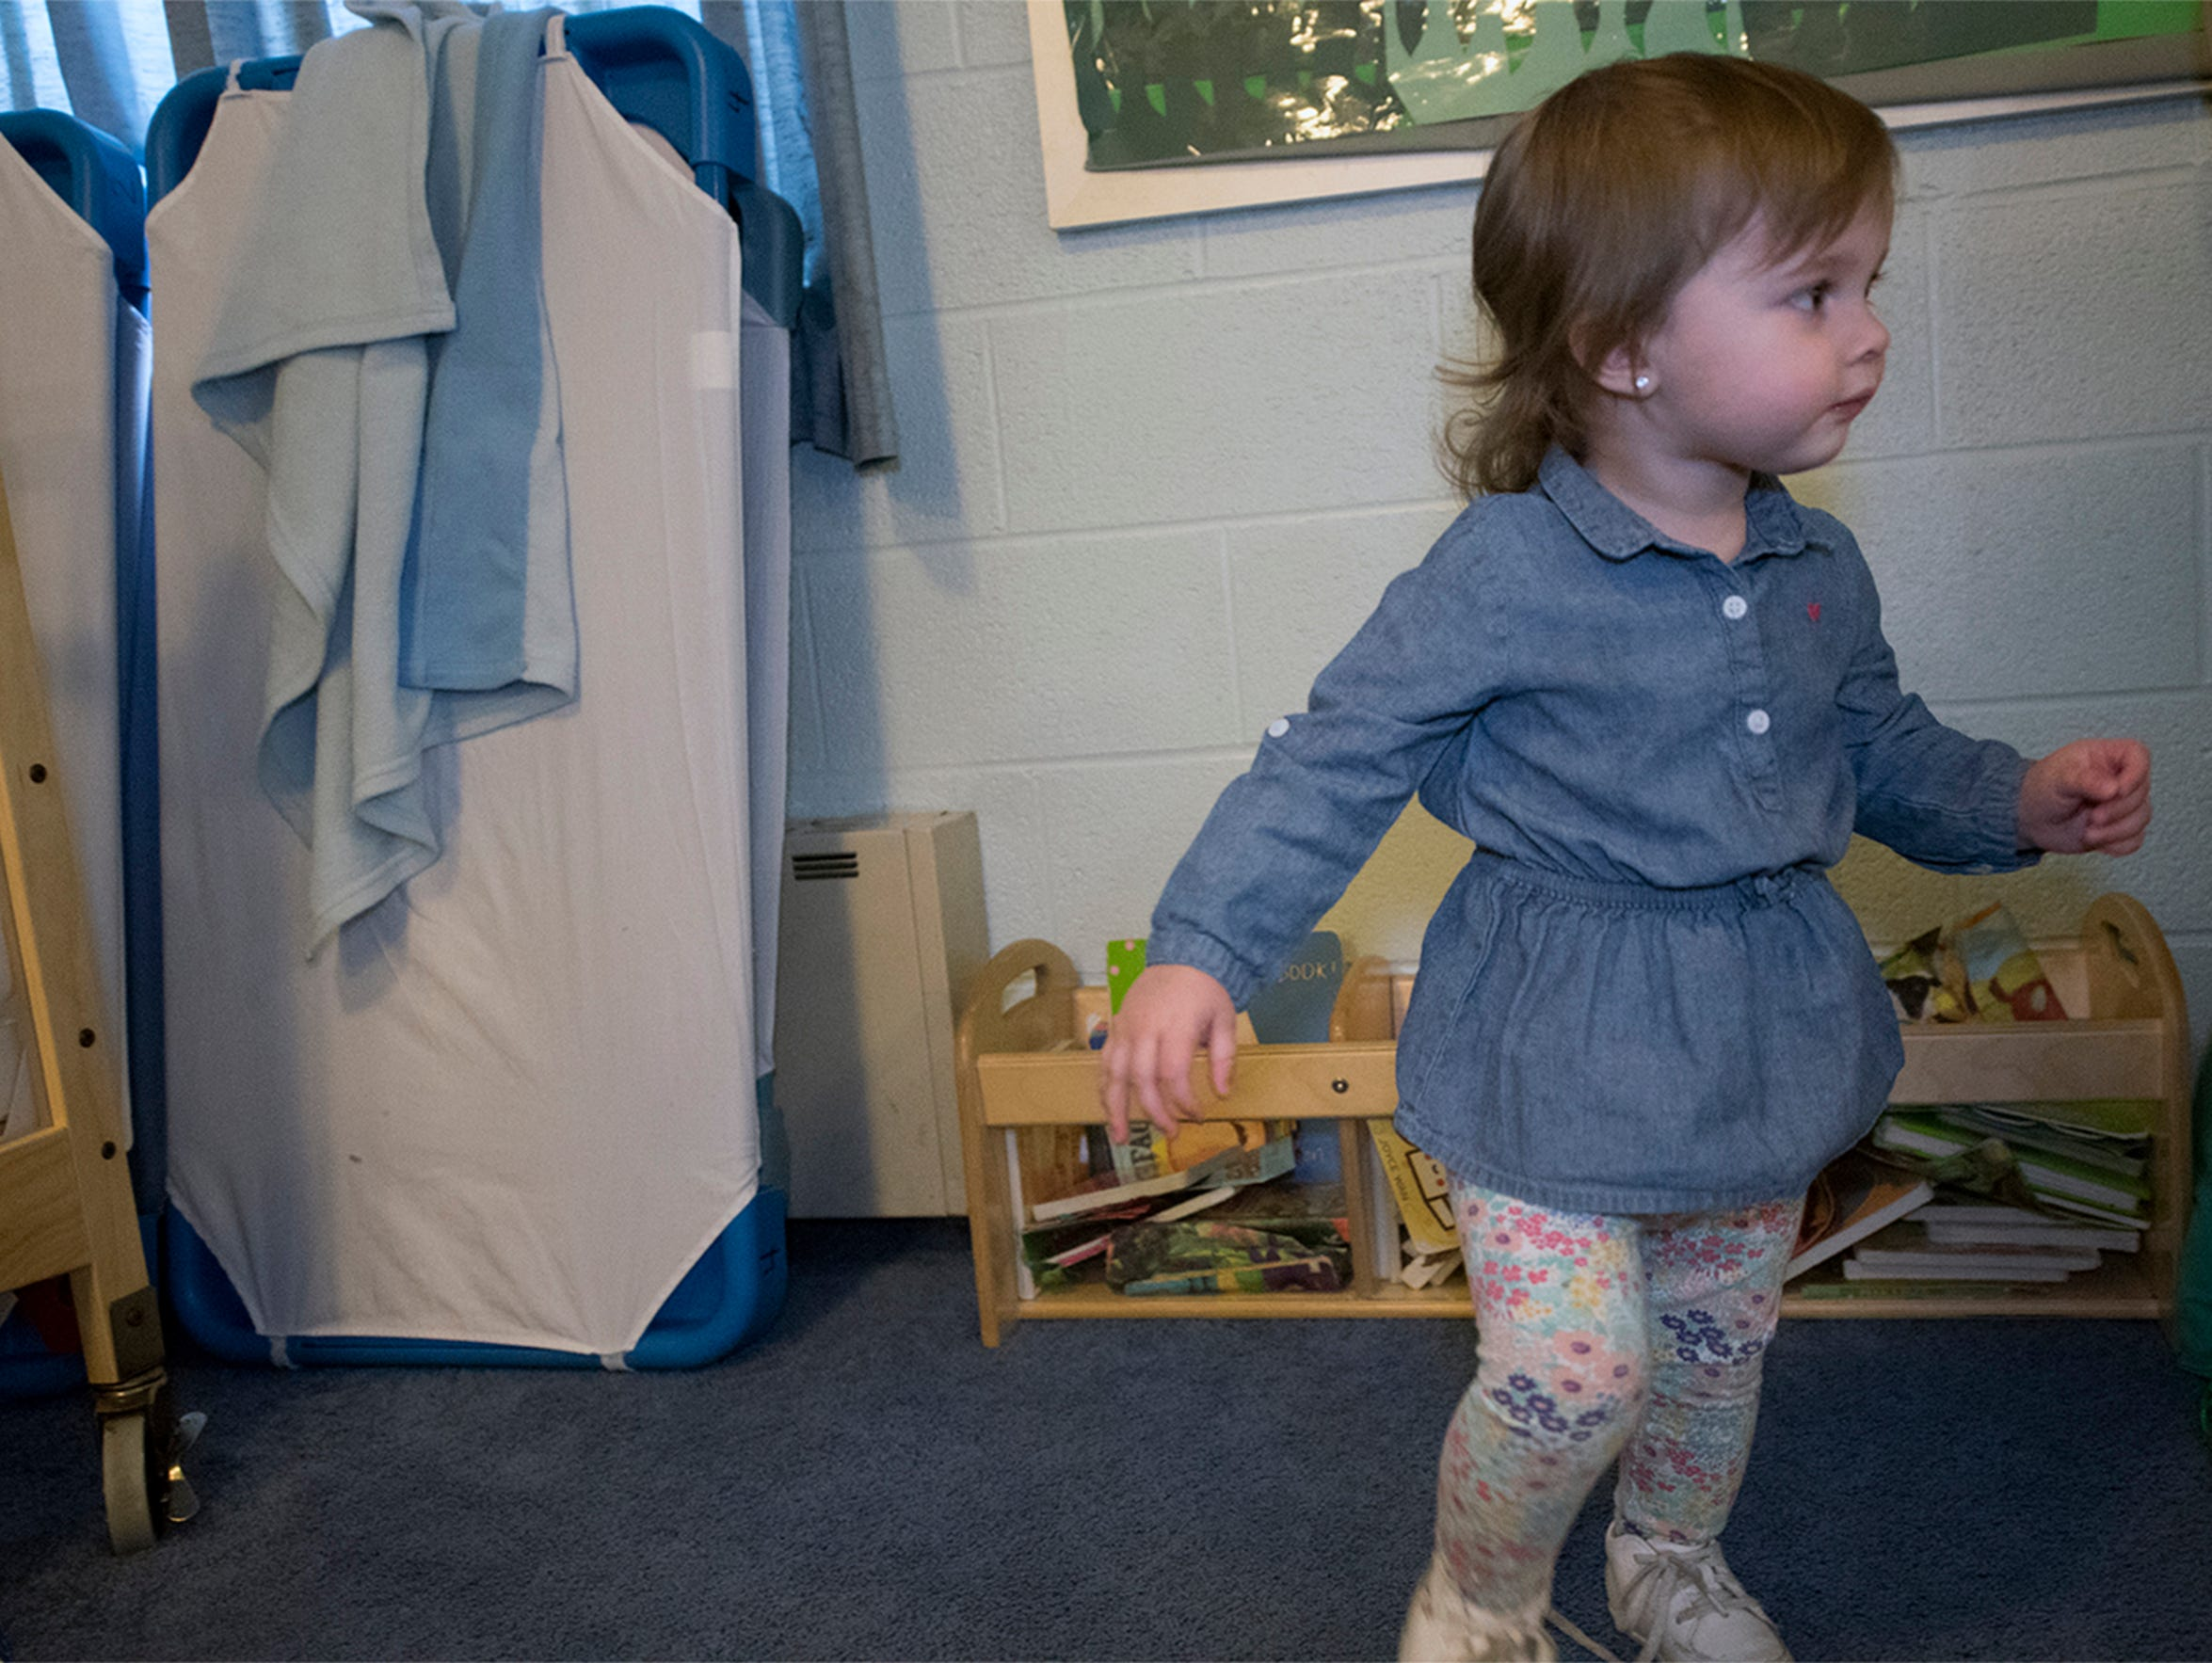 Destini Boxall's daughter, Aislynn, 19-months-old,